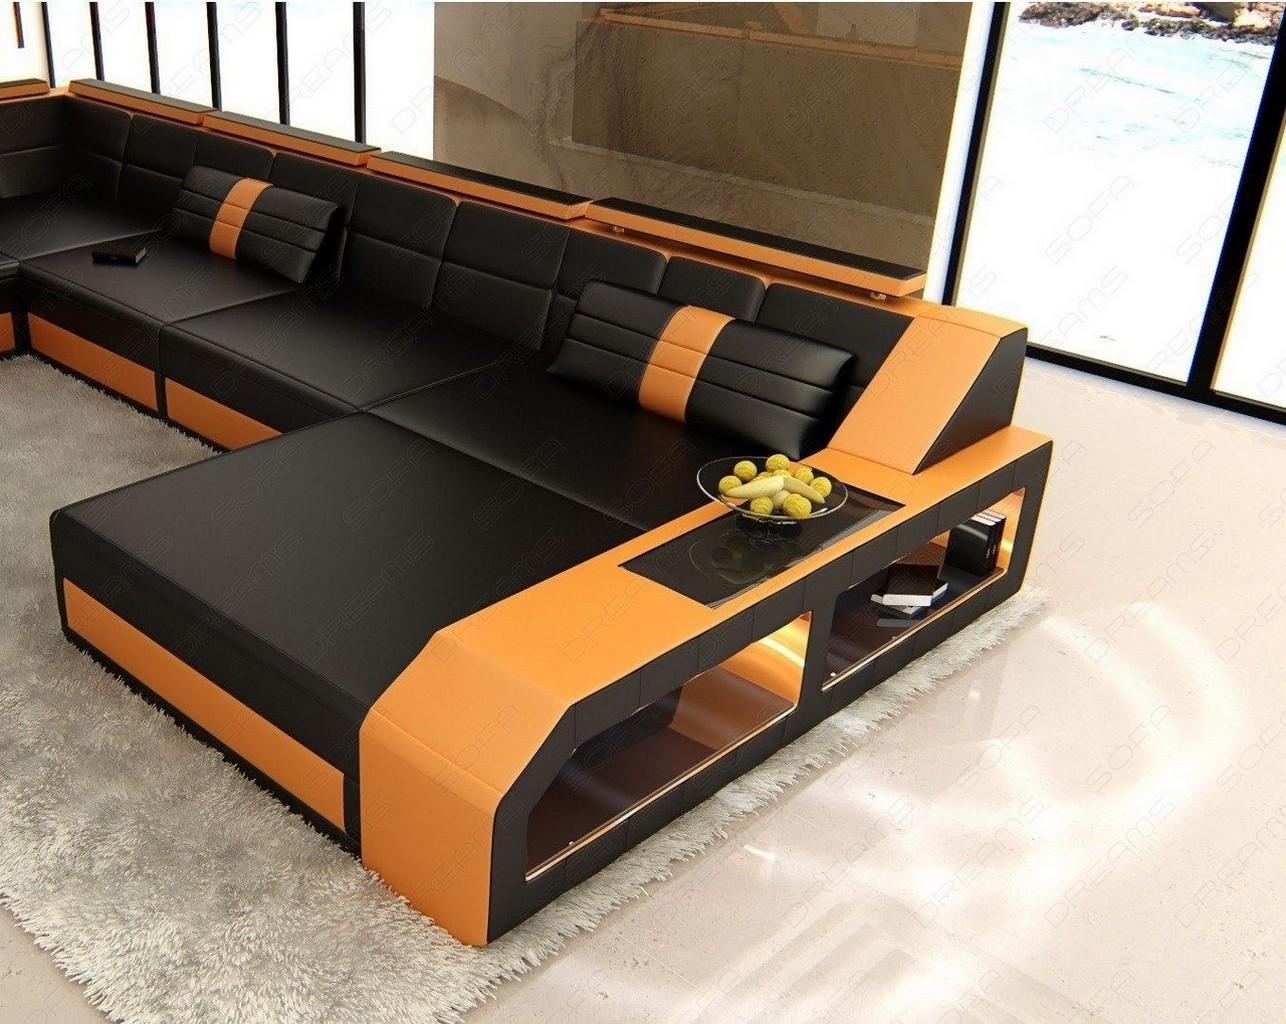 wohnlandschaft matera xxl u form ecksofa design couch beleuchtung sofa ebay. Black Bedroom Furniture Sets. Home Design Ideas